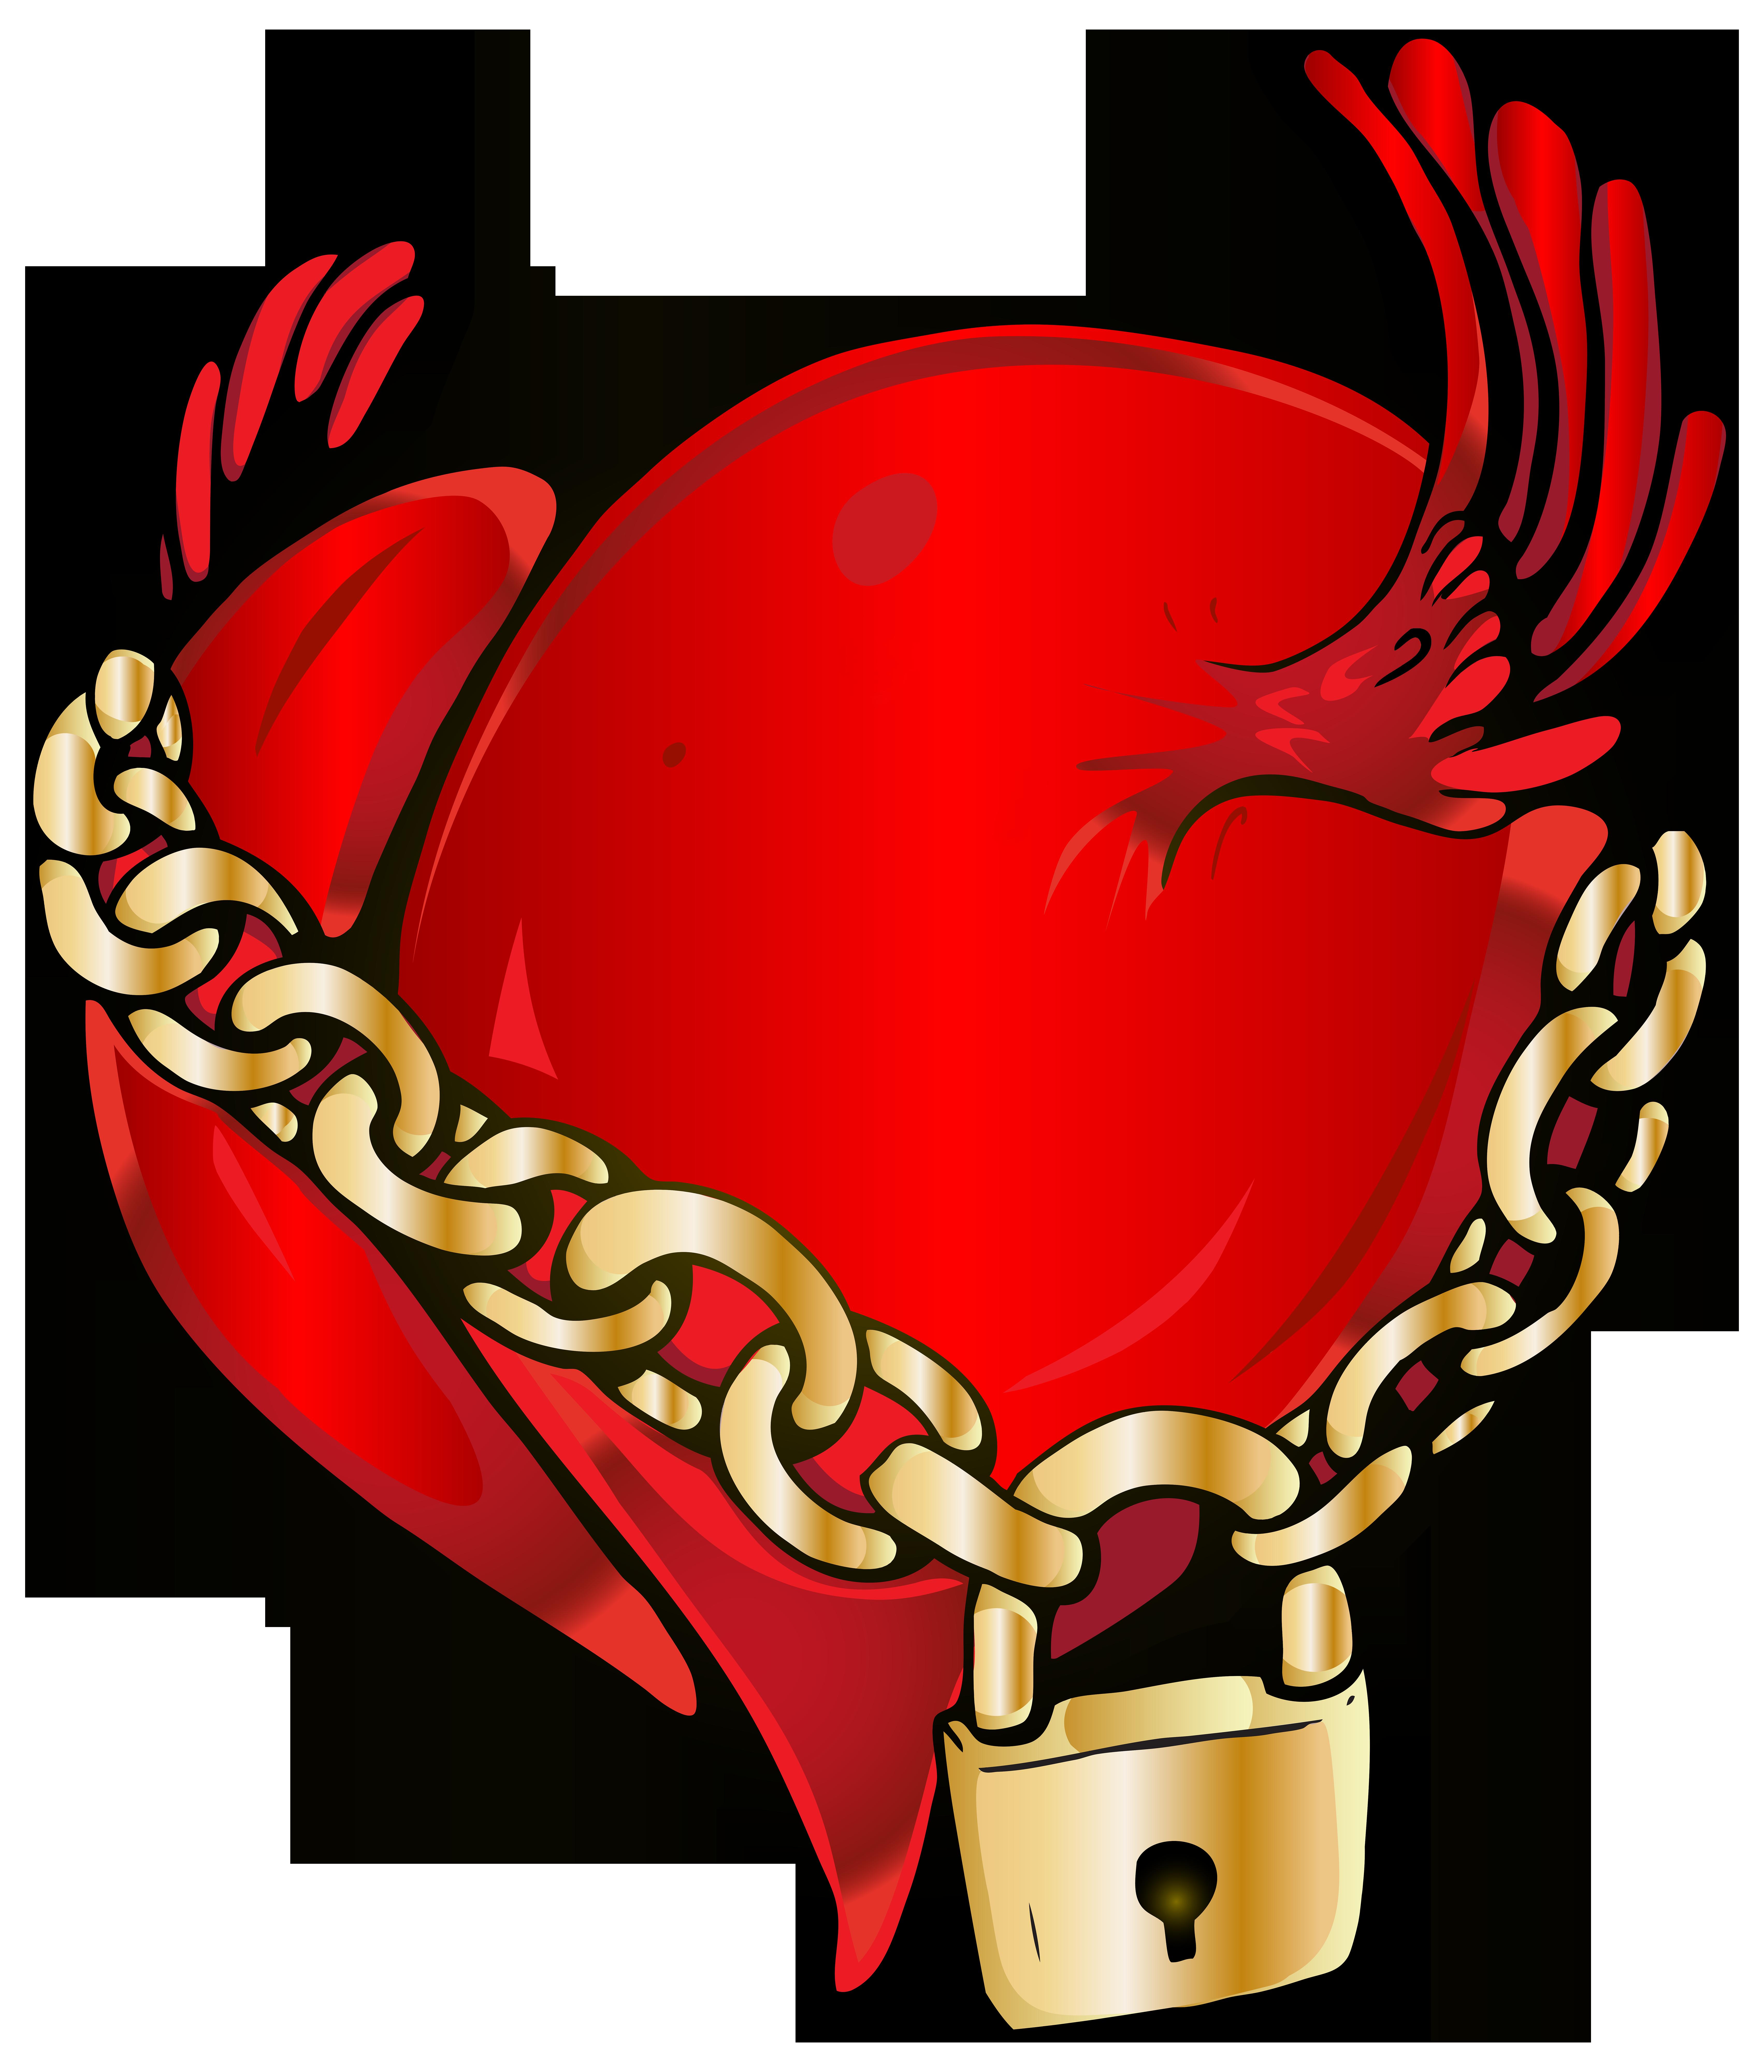 Lock clipart clip art. Locked heart png image